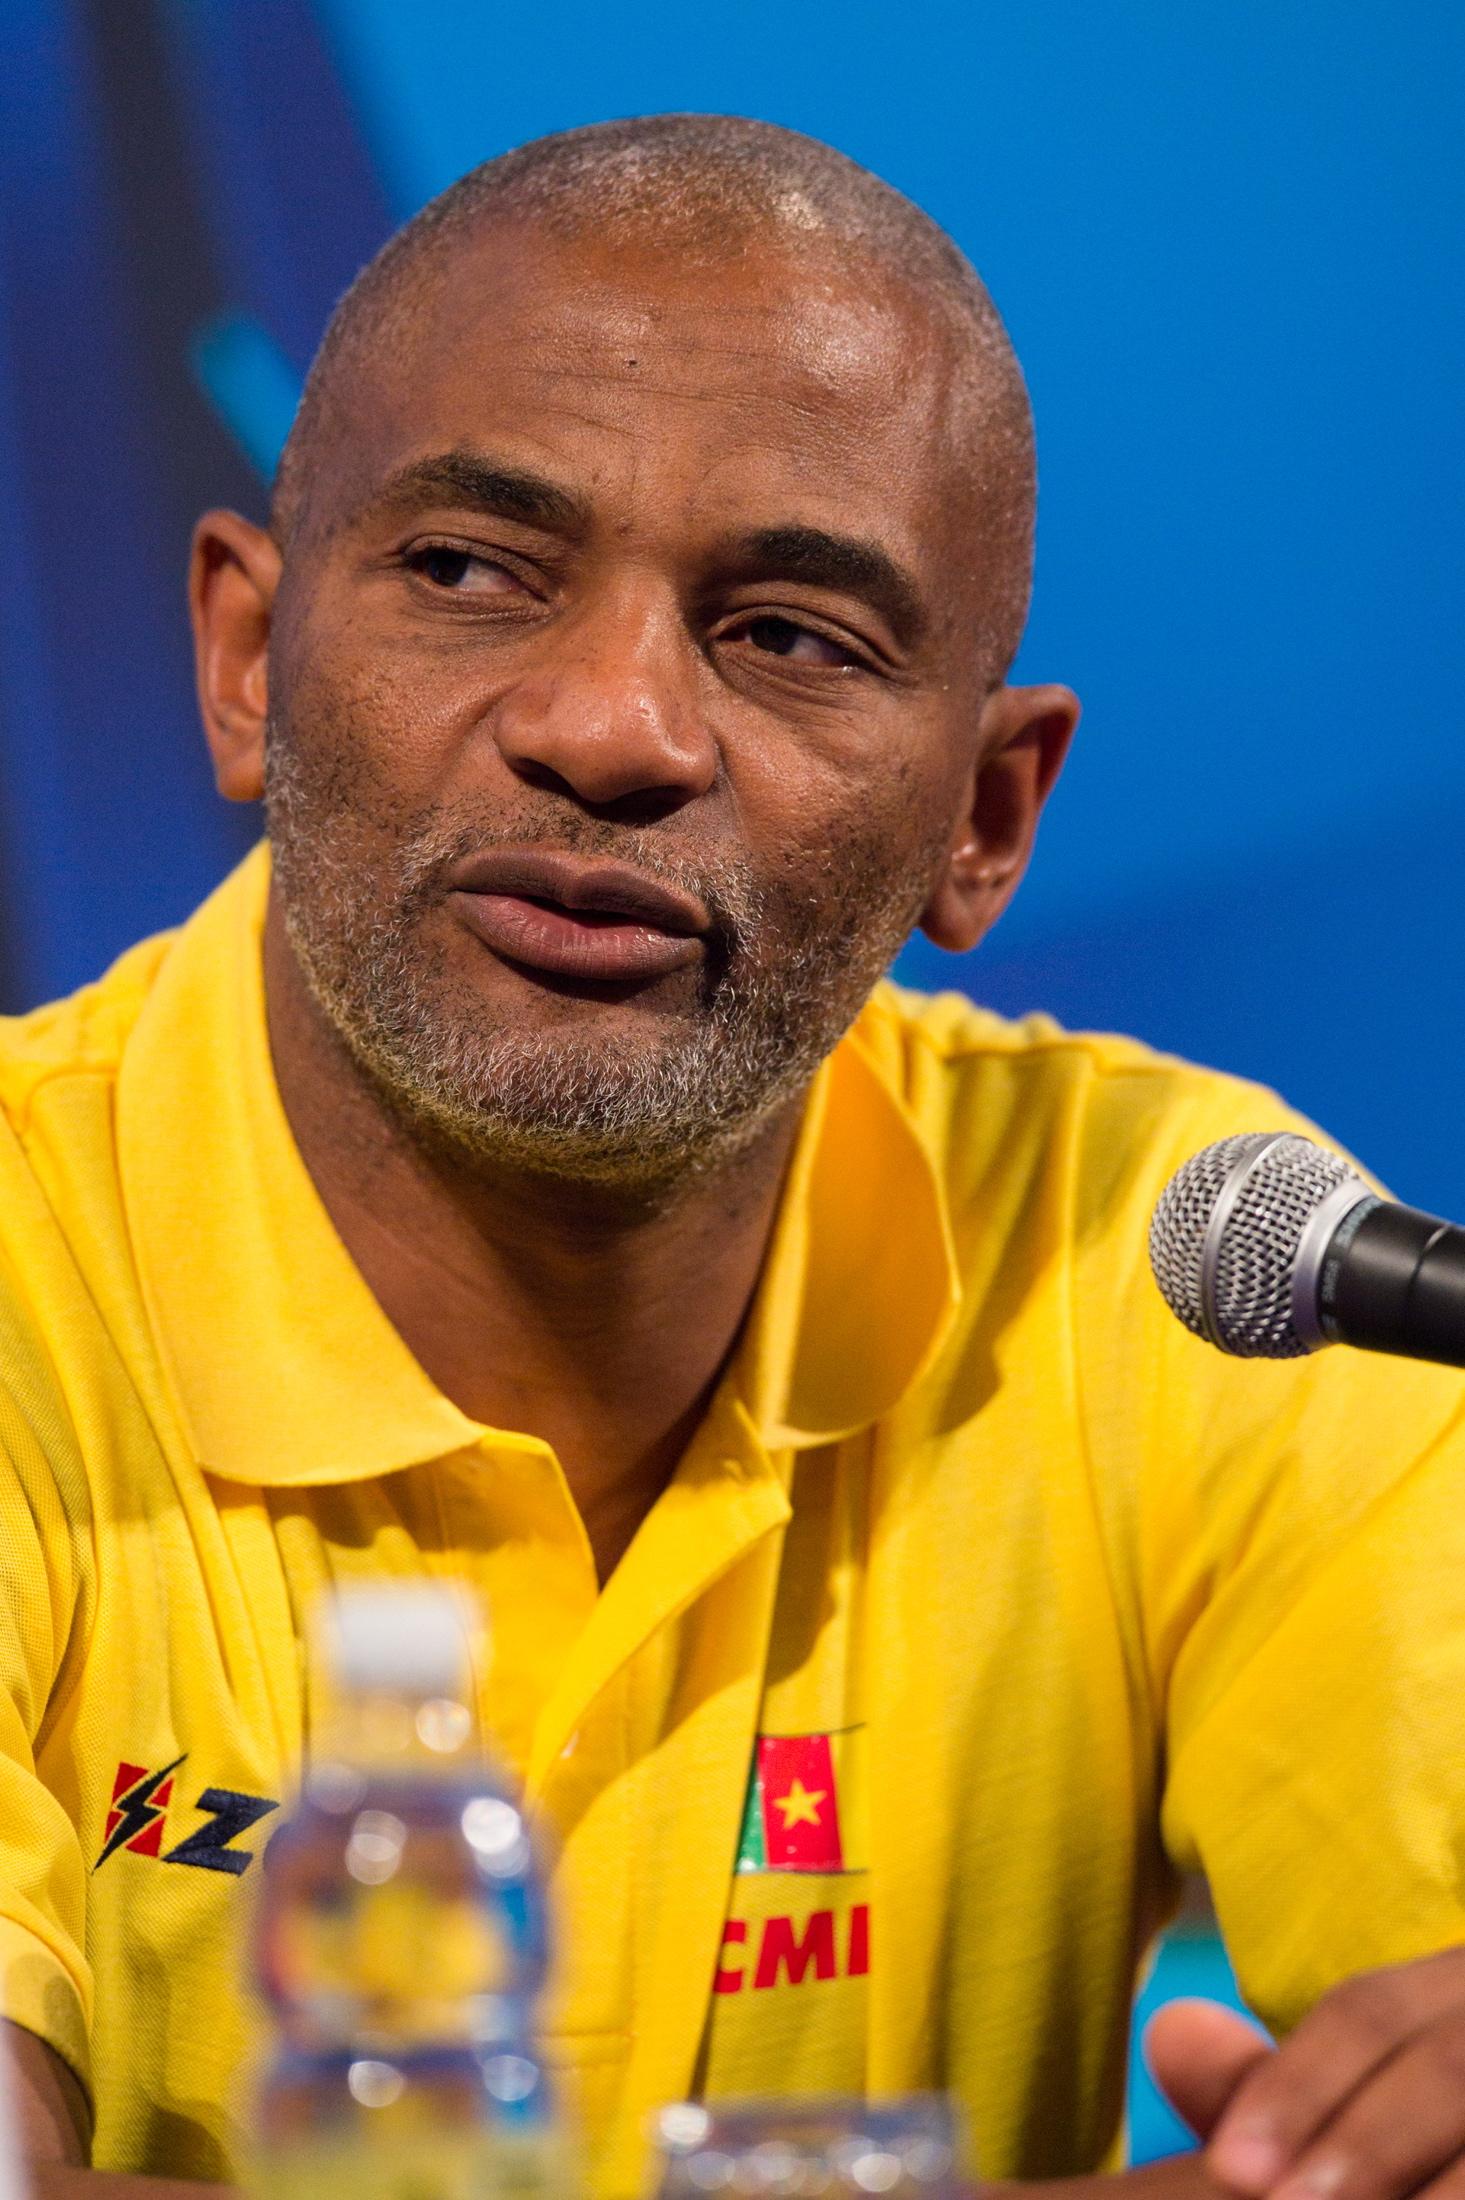 Jean Rene Akono